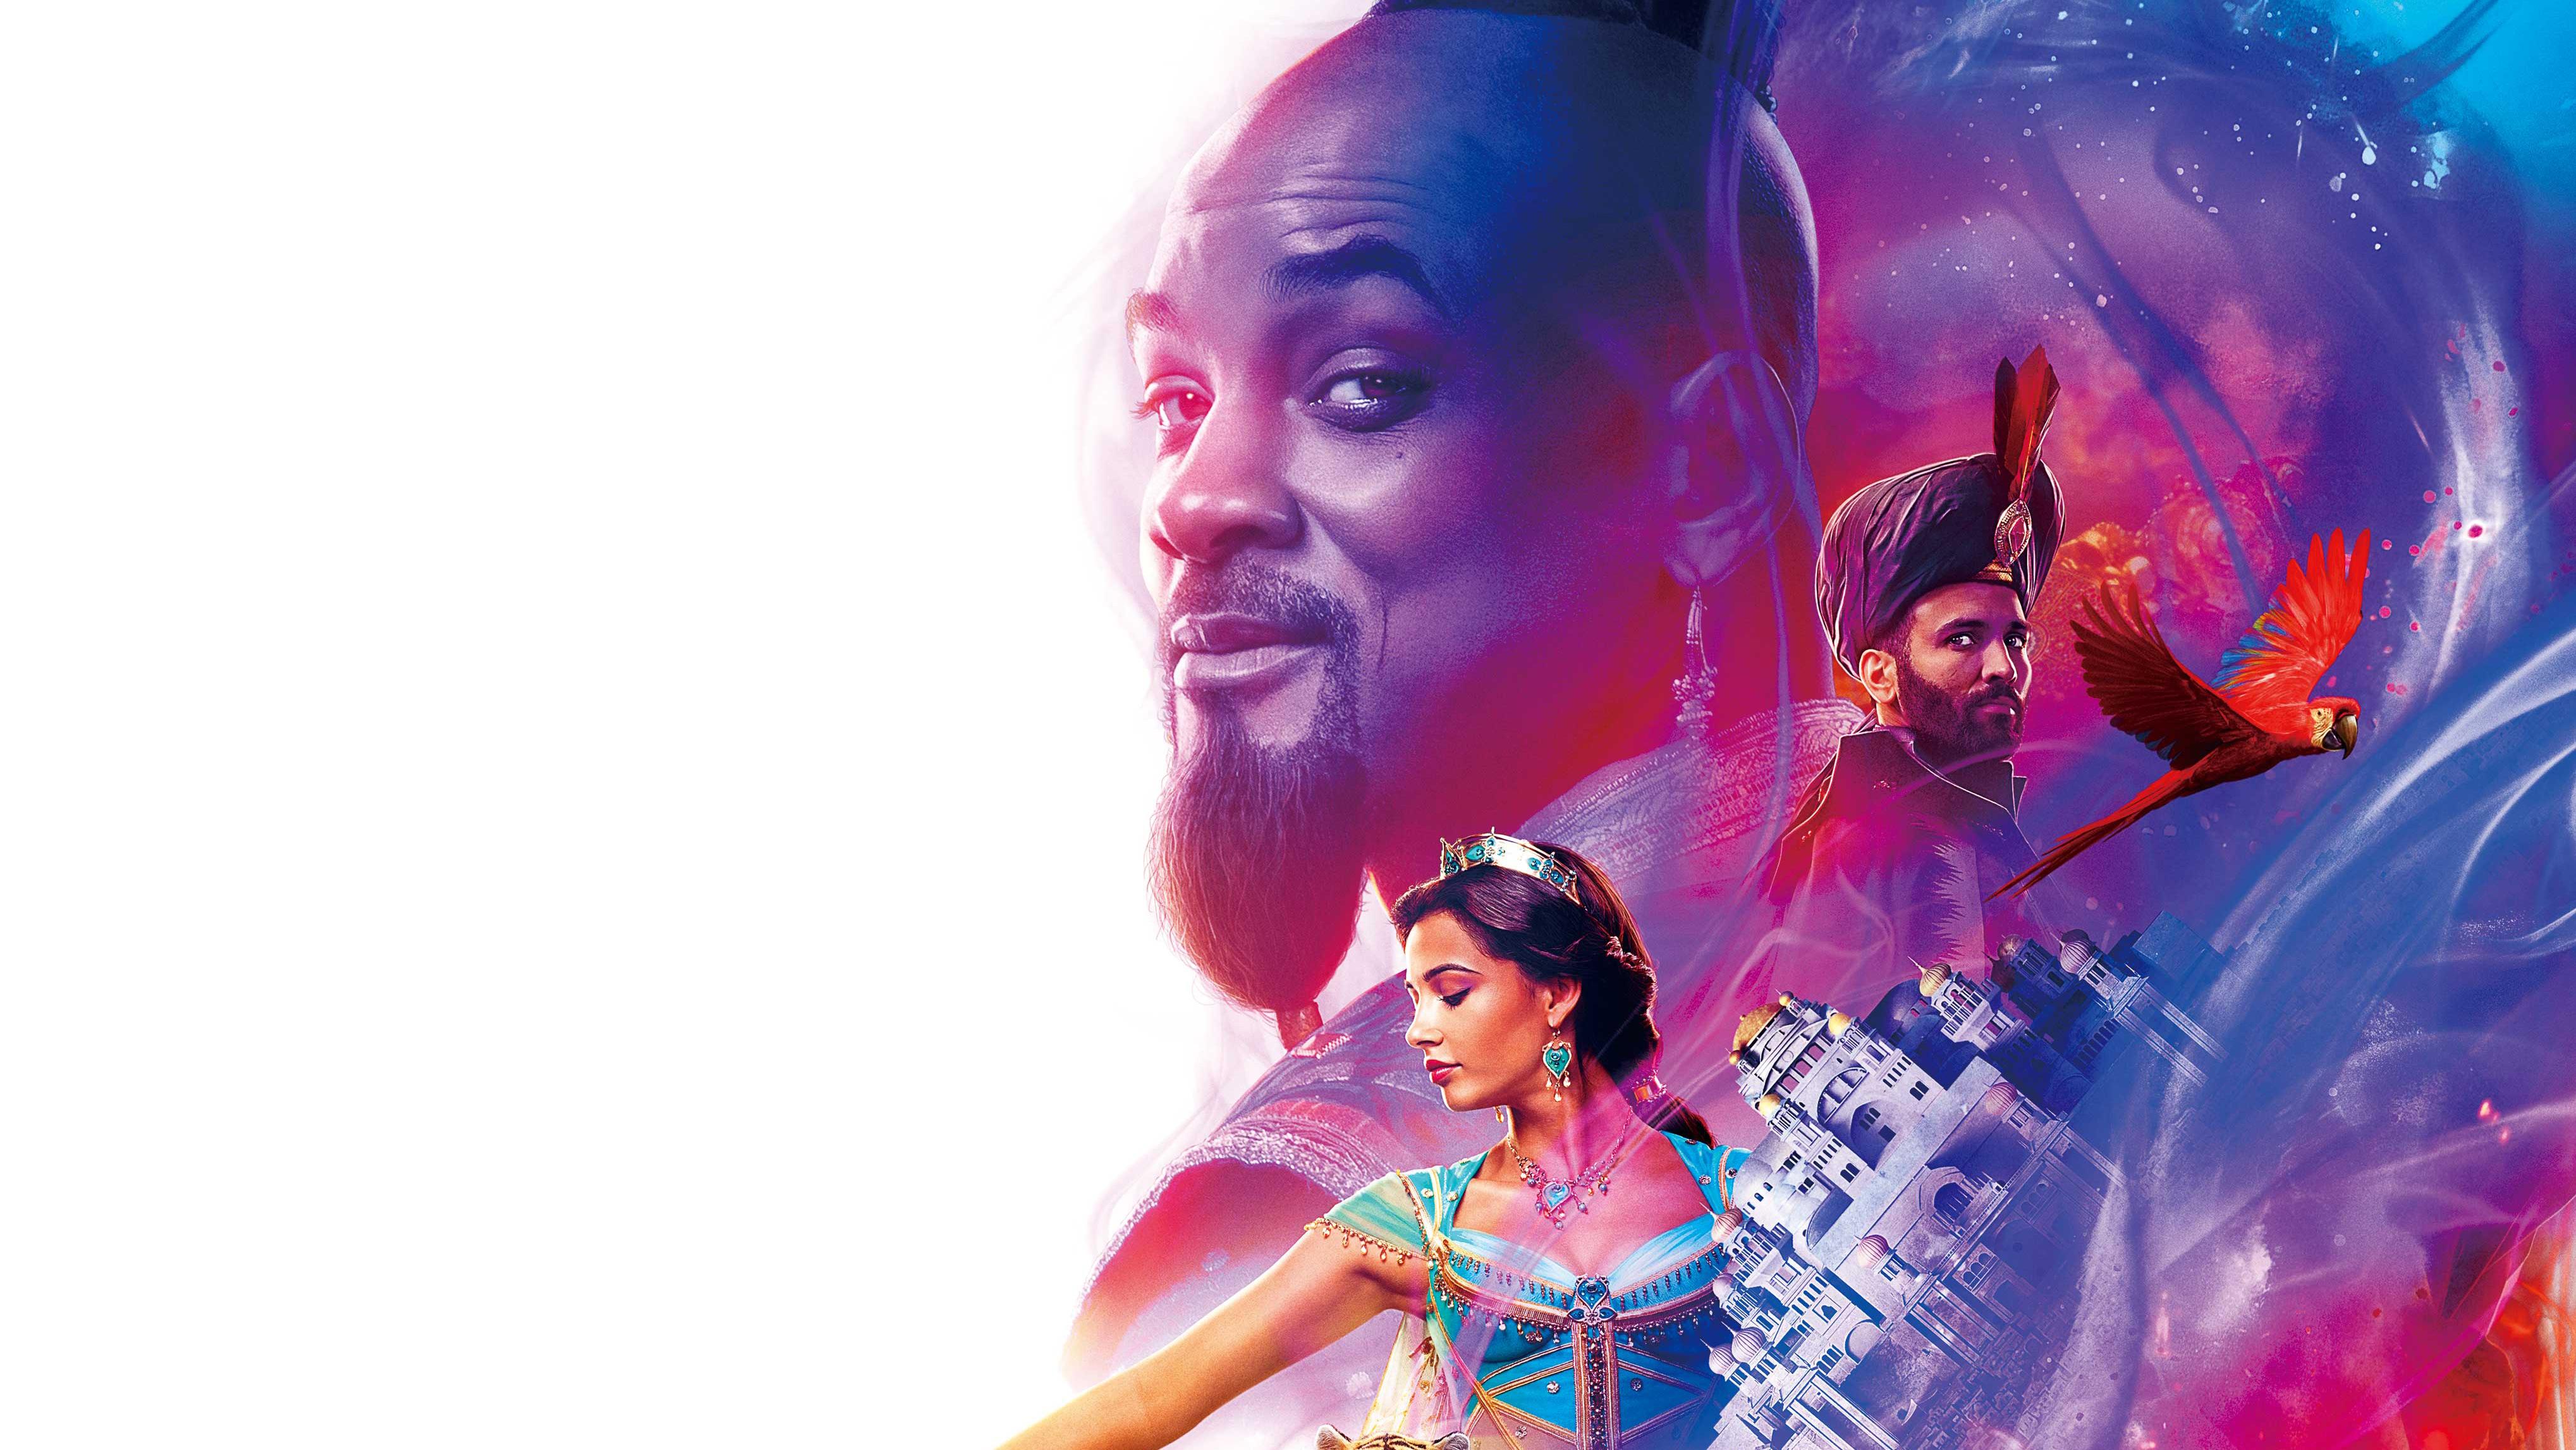 Aladdin 2019 4k Ultra Hd Wallpaper Background Image